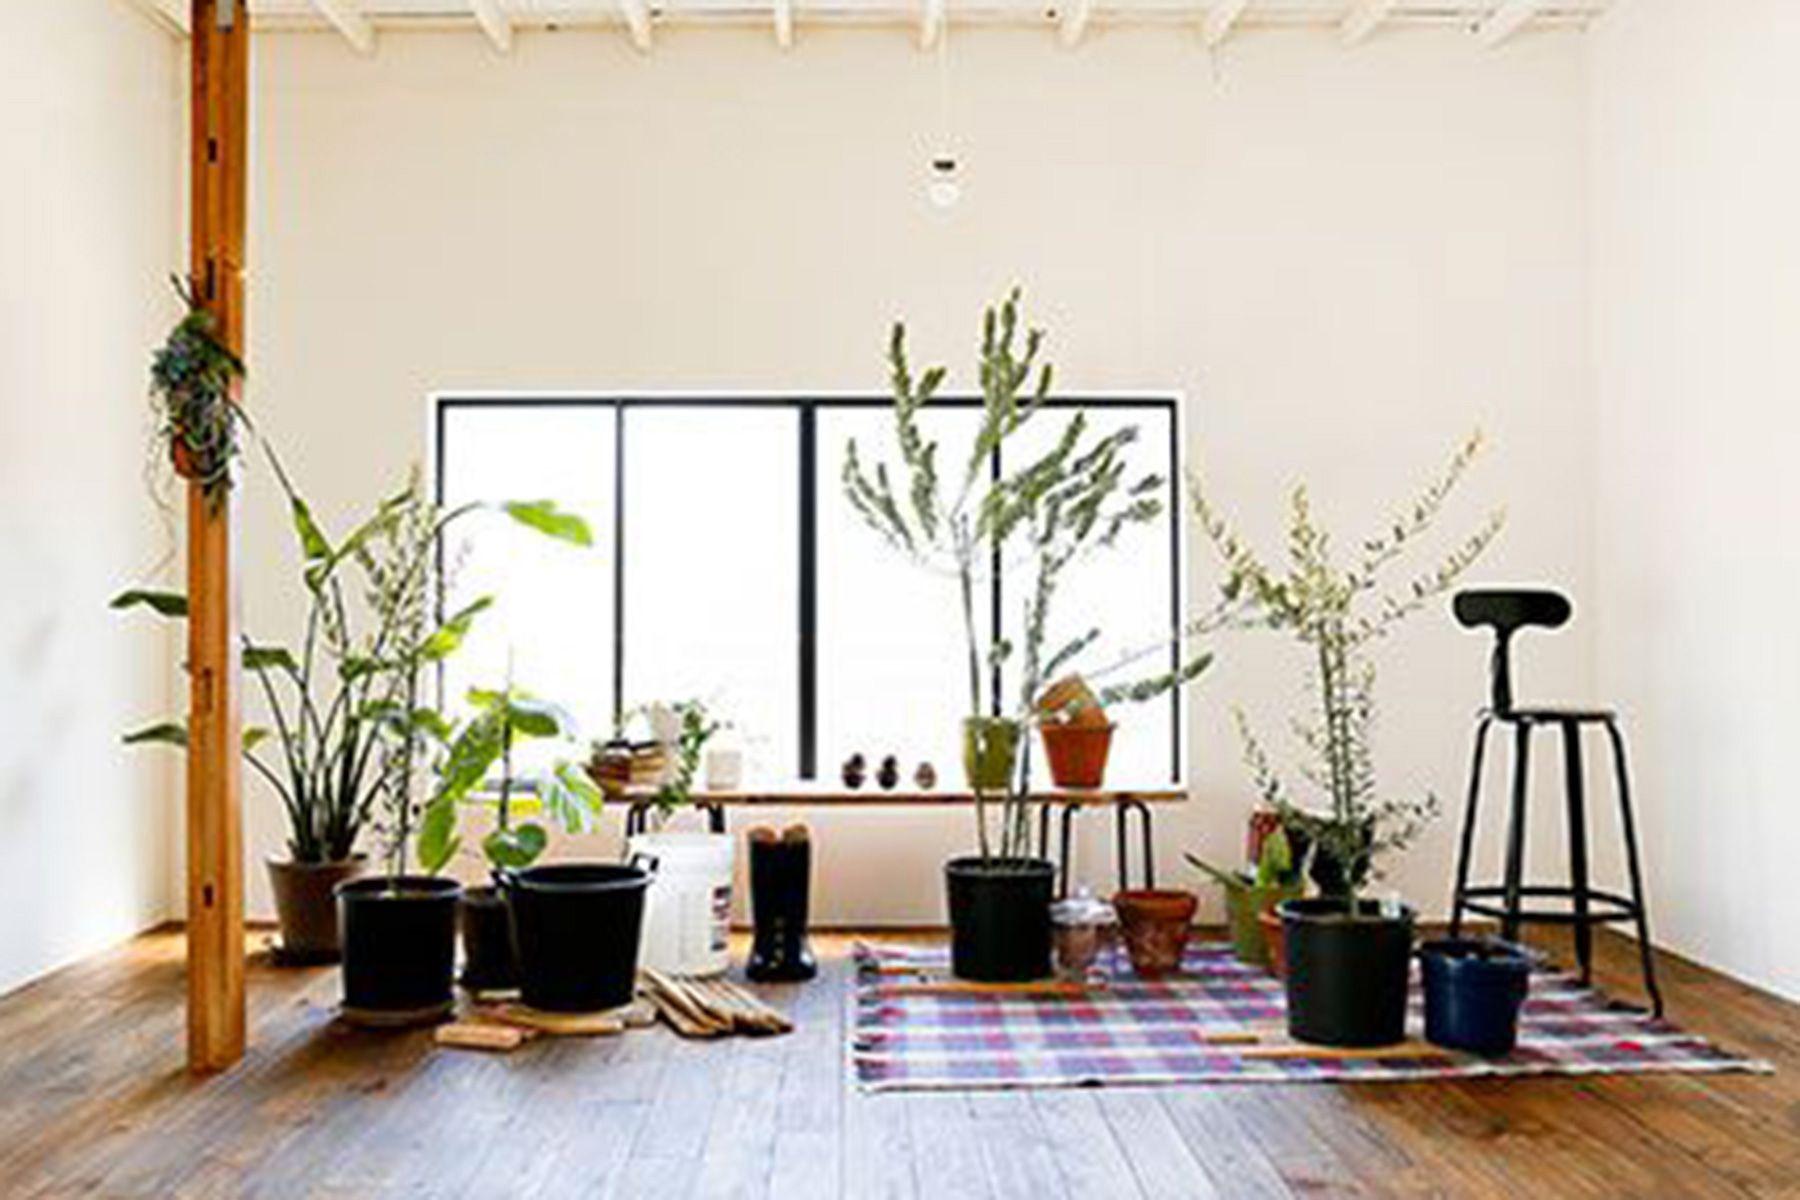 studio PEANUTS (スタジオ ピーナッツ)1F/可動式の壁・白